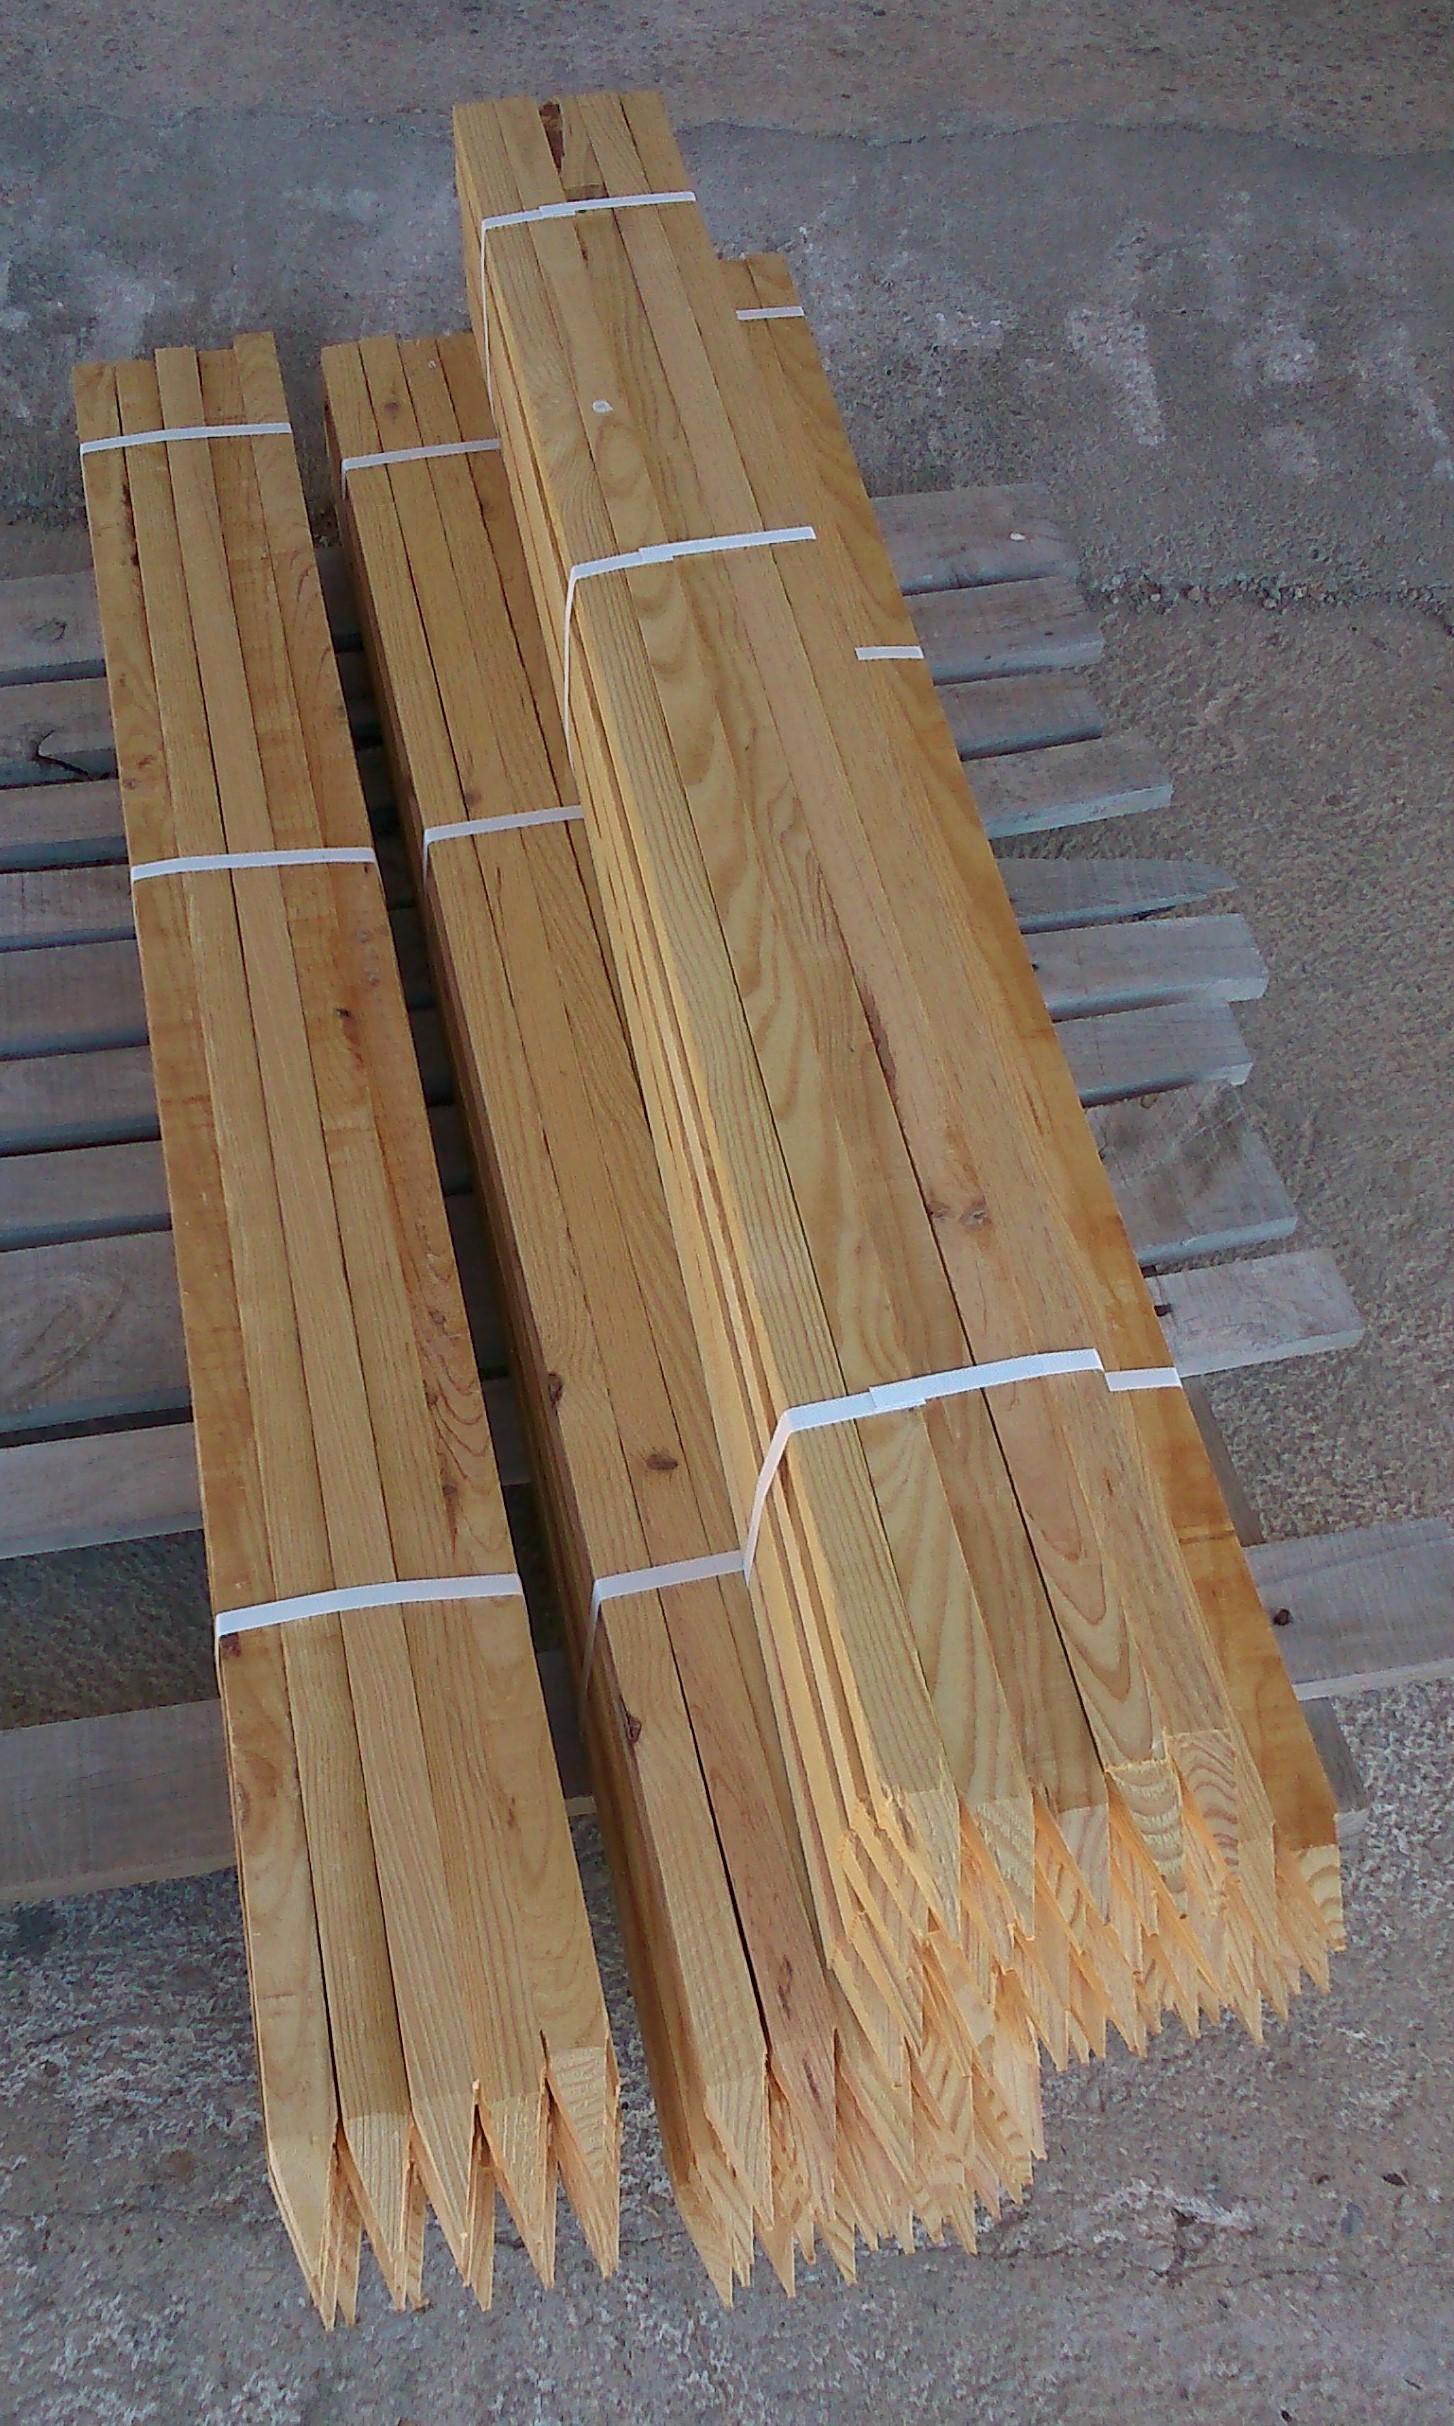 Postes de madera tratada blastdesal - Postes de madera tratada ...